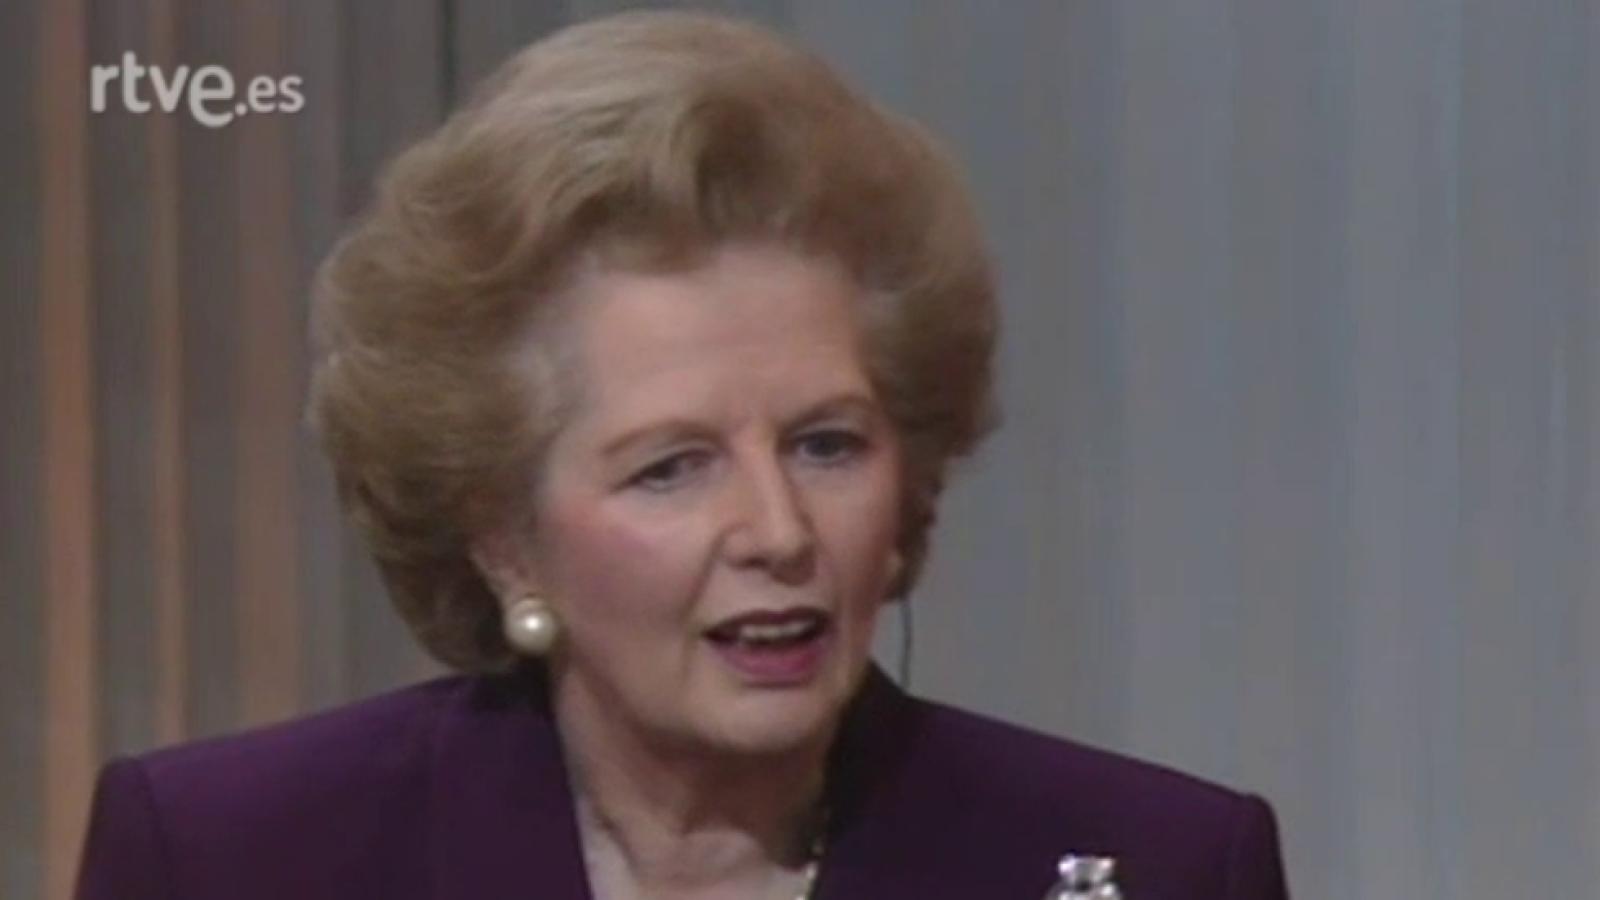 Primero izquierda - Margaret Thatcher